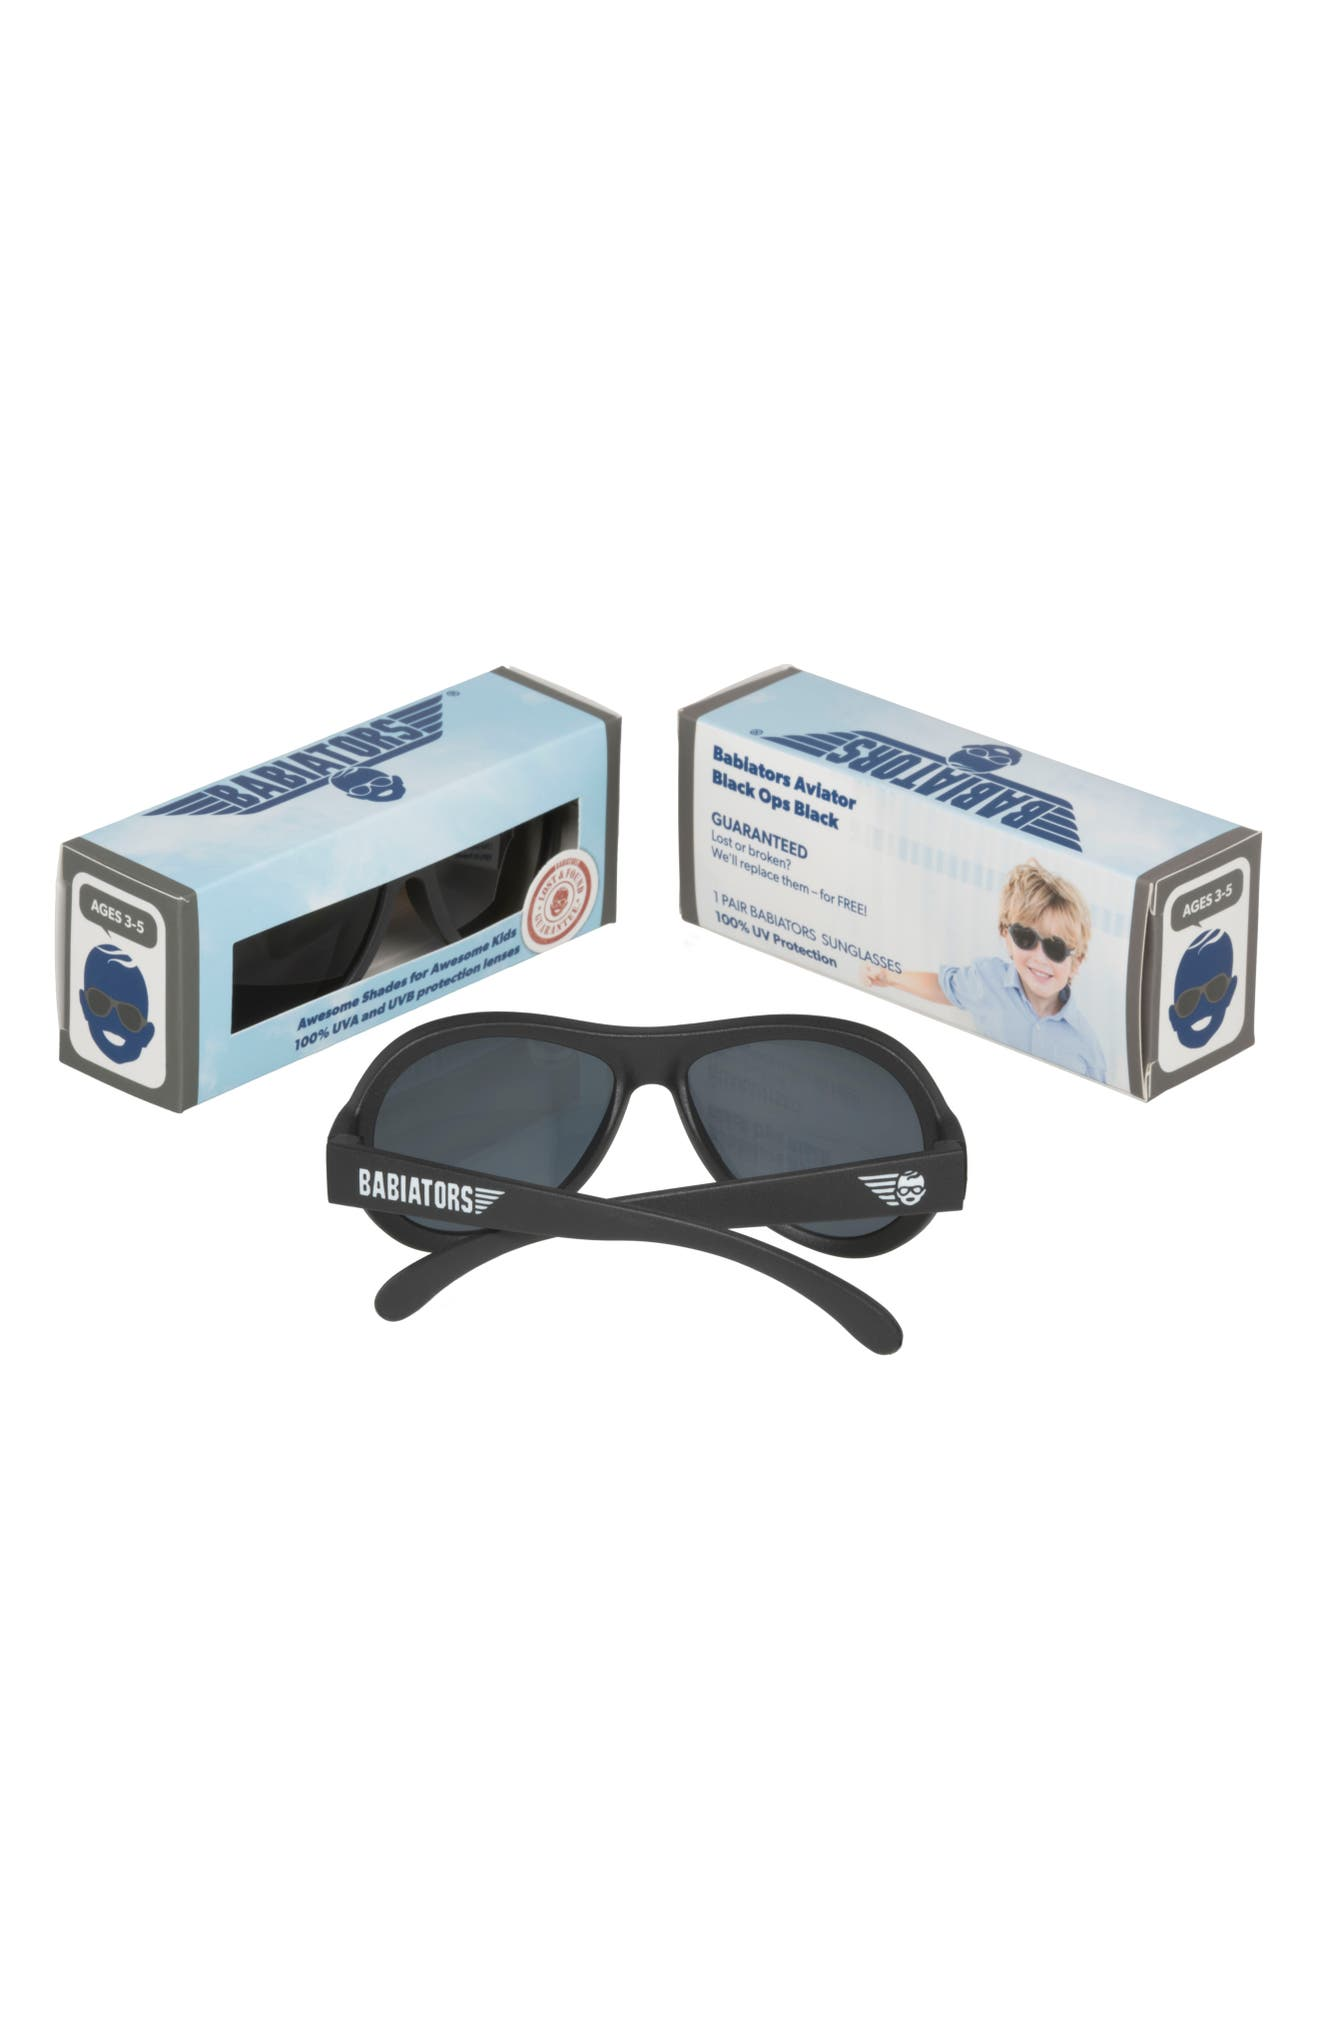 752f1d7c37d5 Babiators  Junior Babiators  Sunglasses (Baby   Toddler)